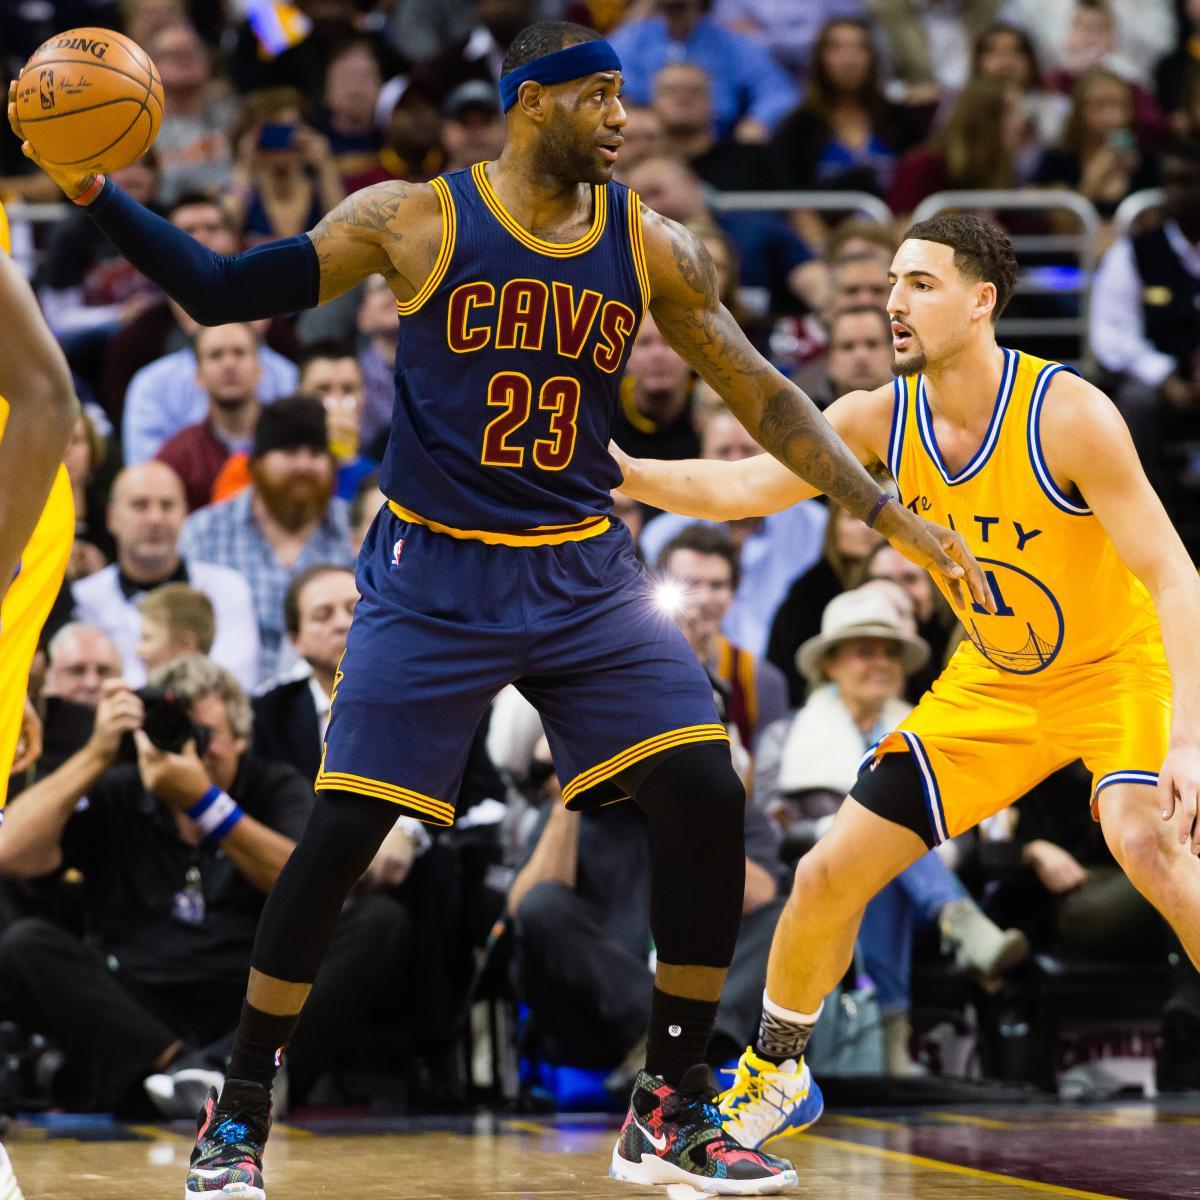 Cavaliers vs warriors game 7 predictions - Nba Finals 2016 Cavaliers Vs Warriors Game 1 Odds Props And Predictions Bleacher Report